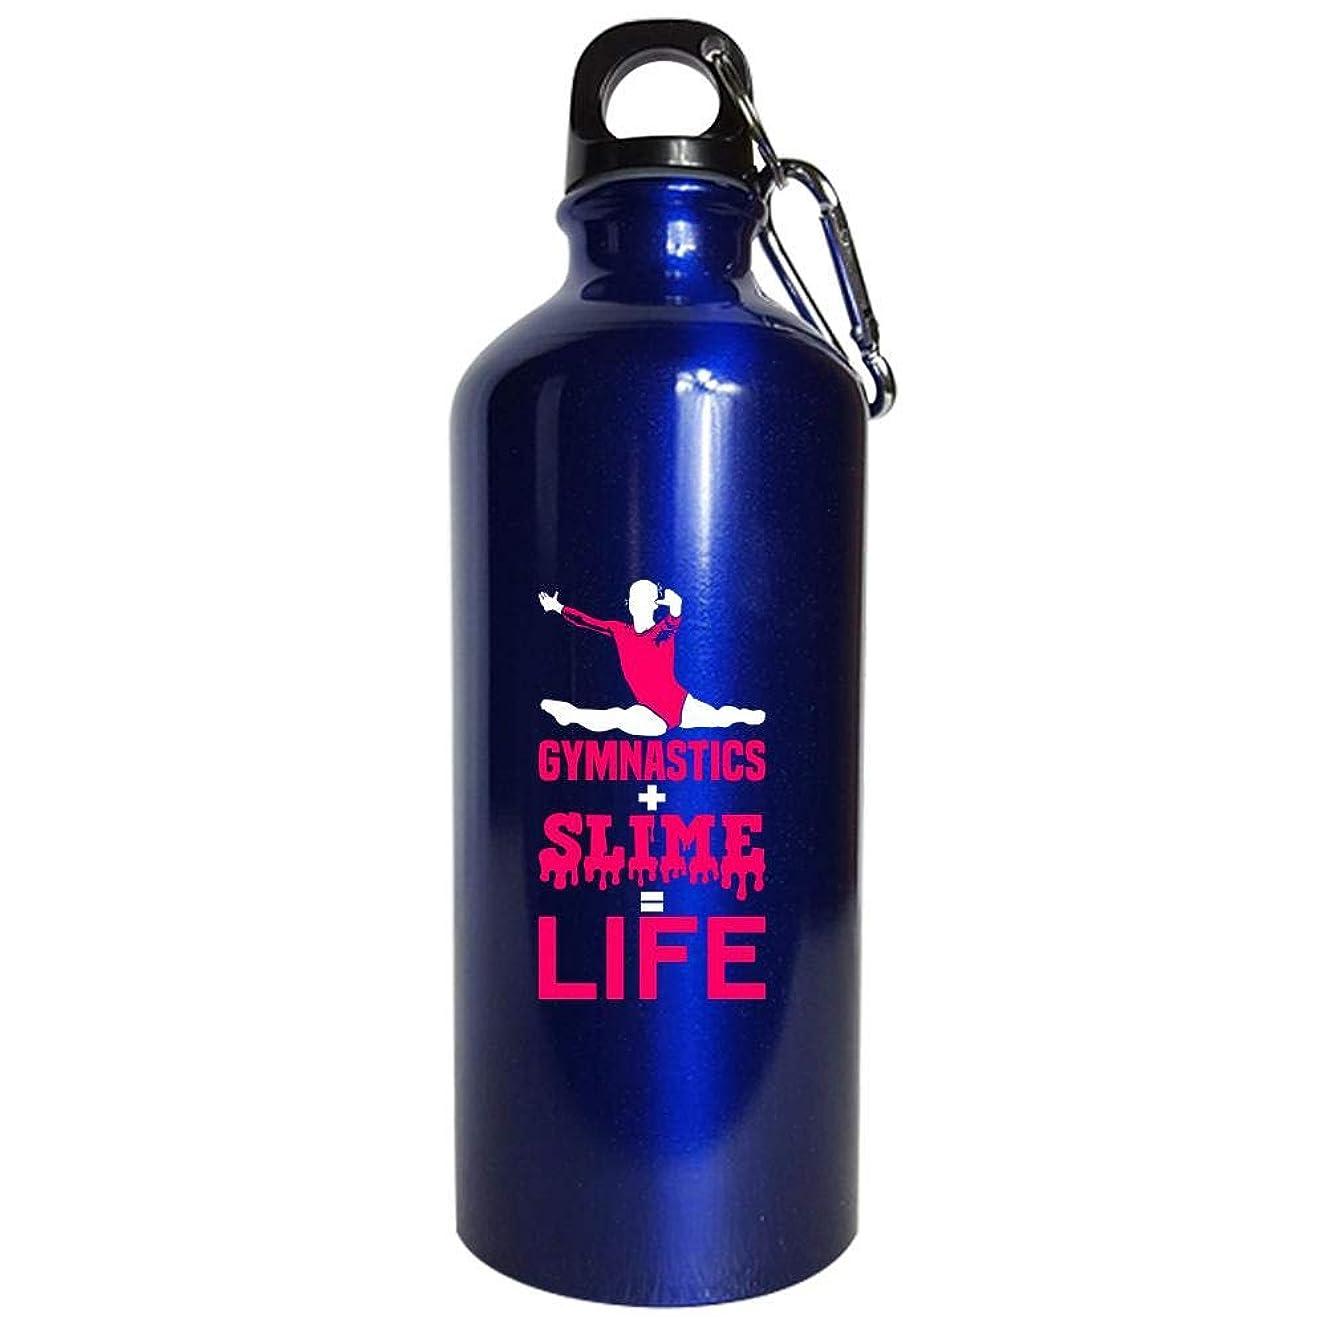 Gymnastics and Slime Is Life Sports Fan - Water Bottle Metallic Blue